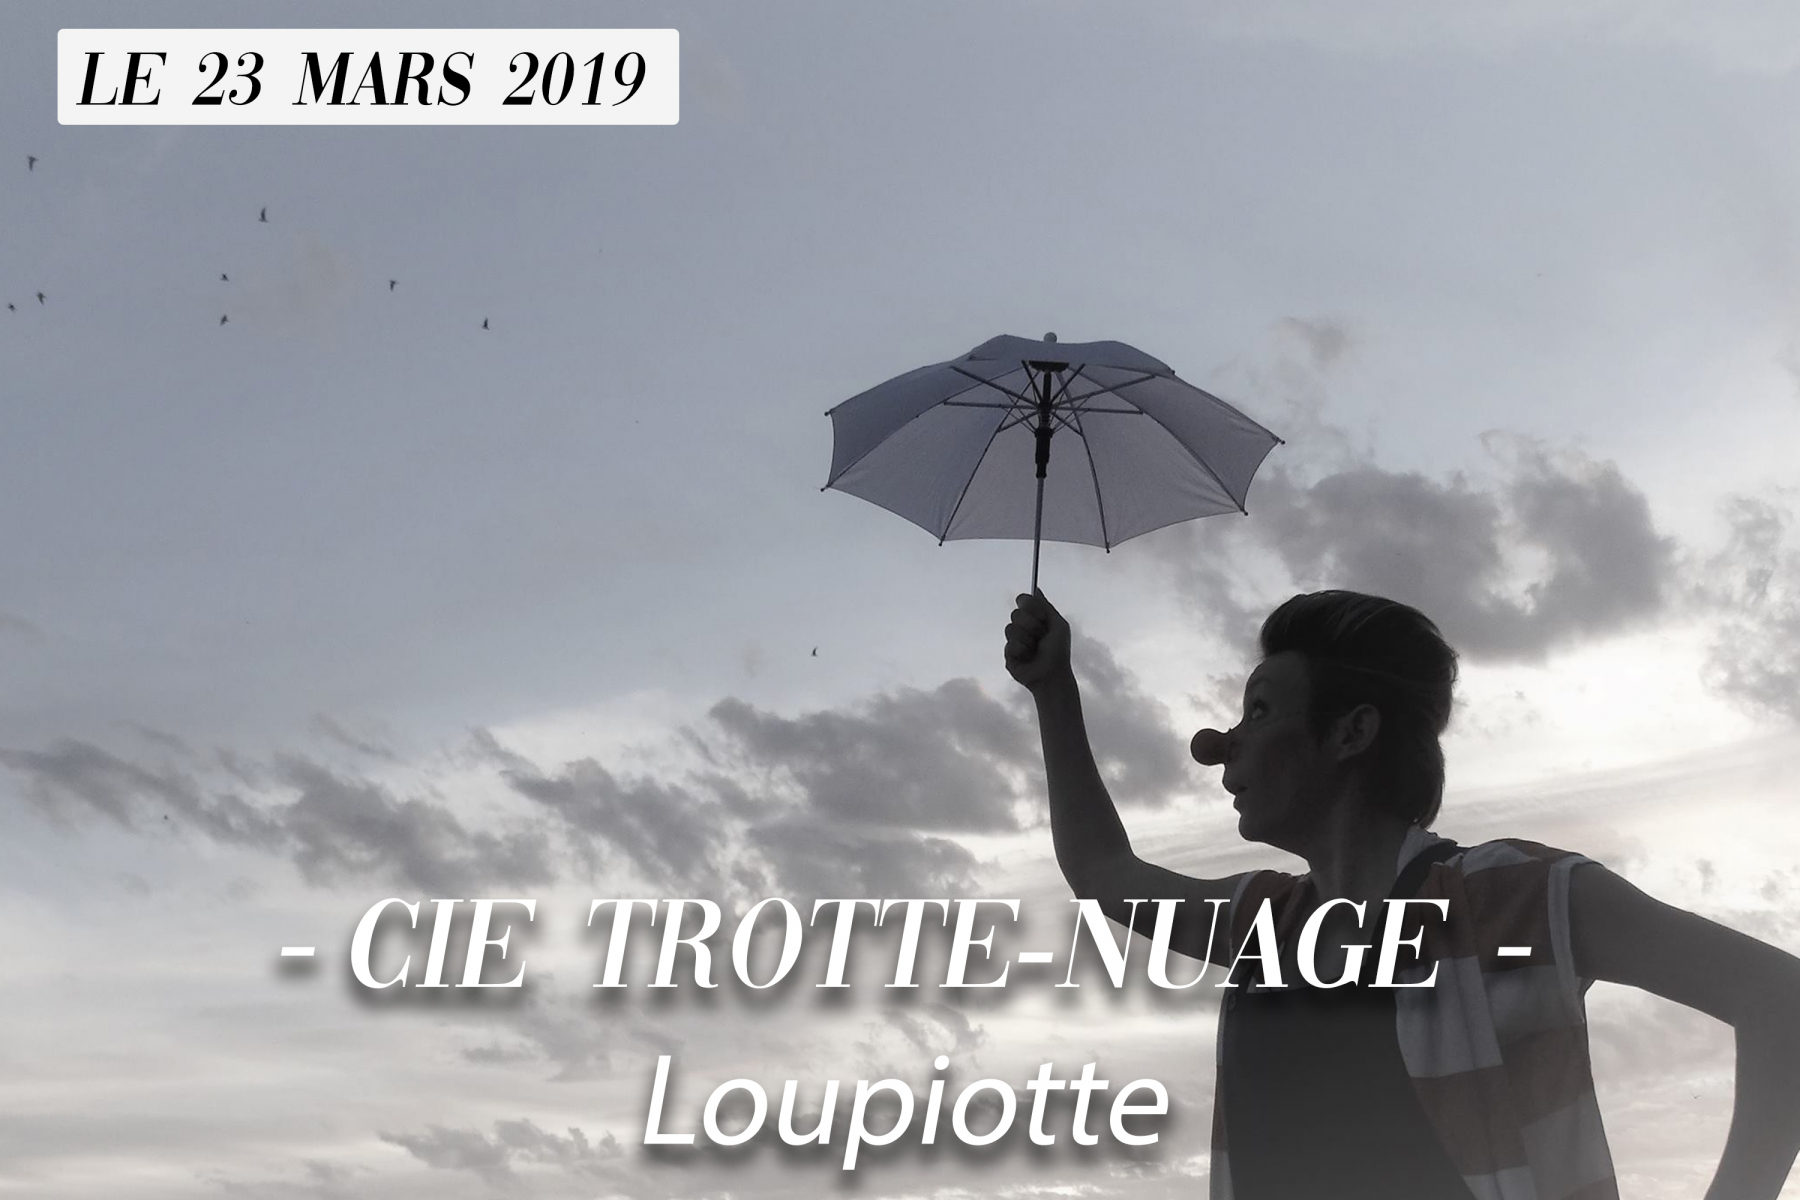 Cie-Trotte-Nuage